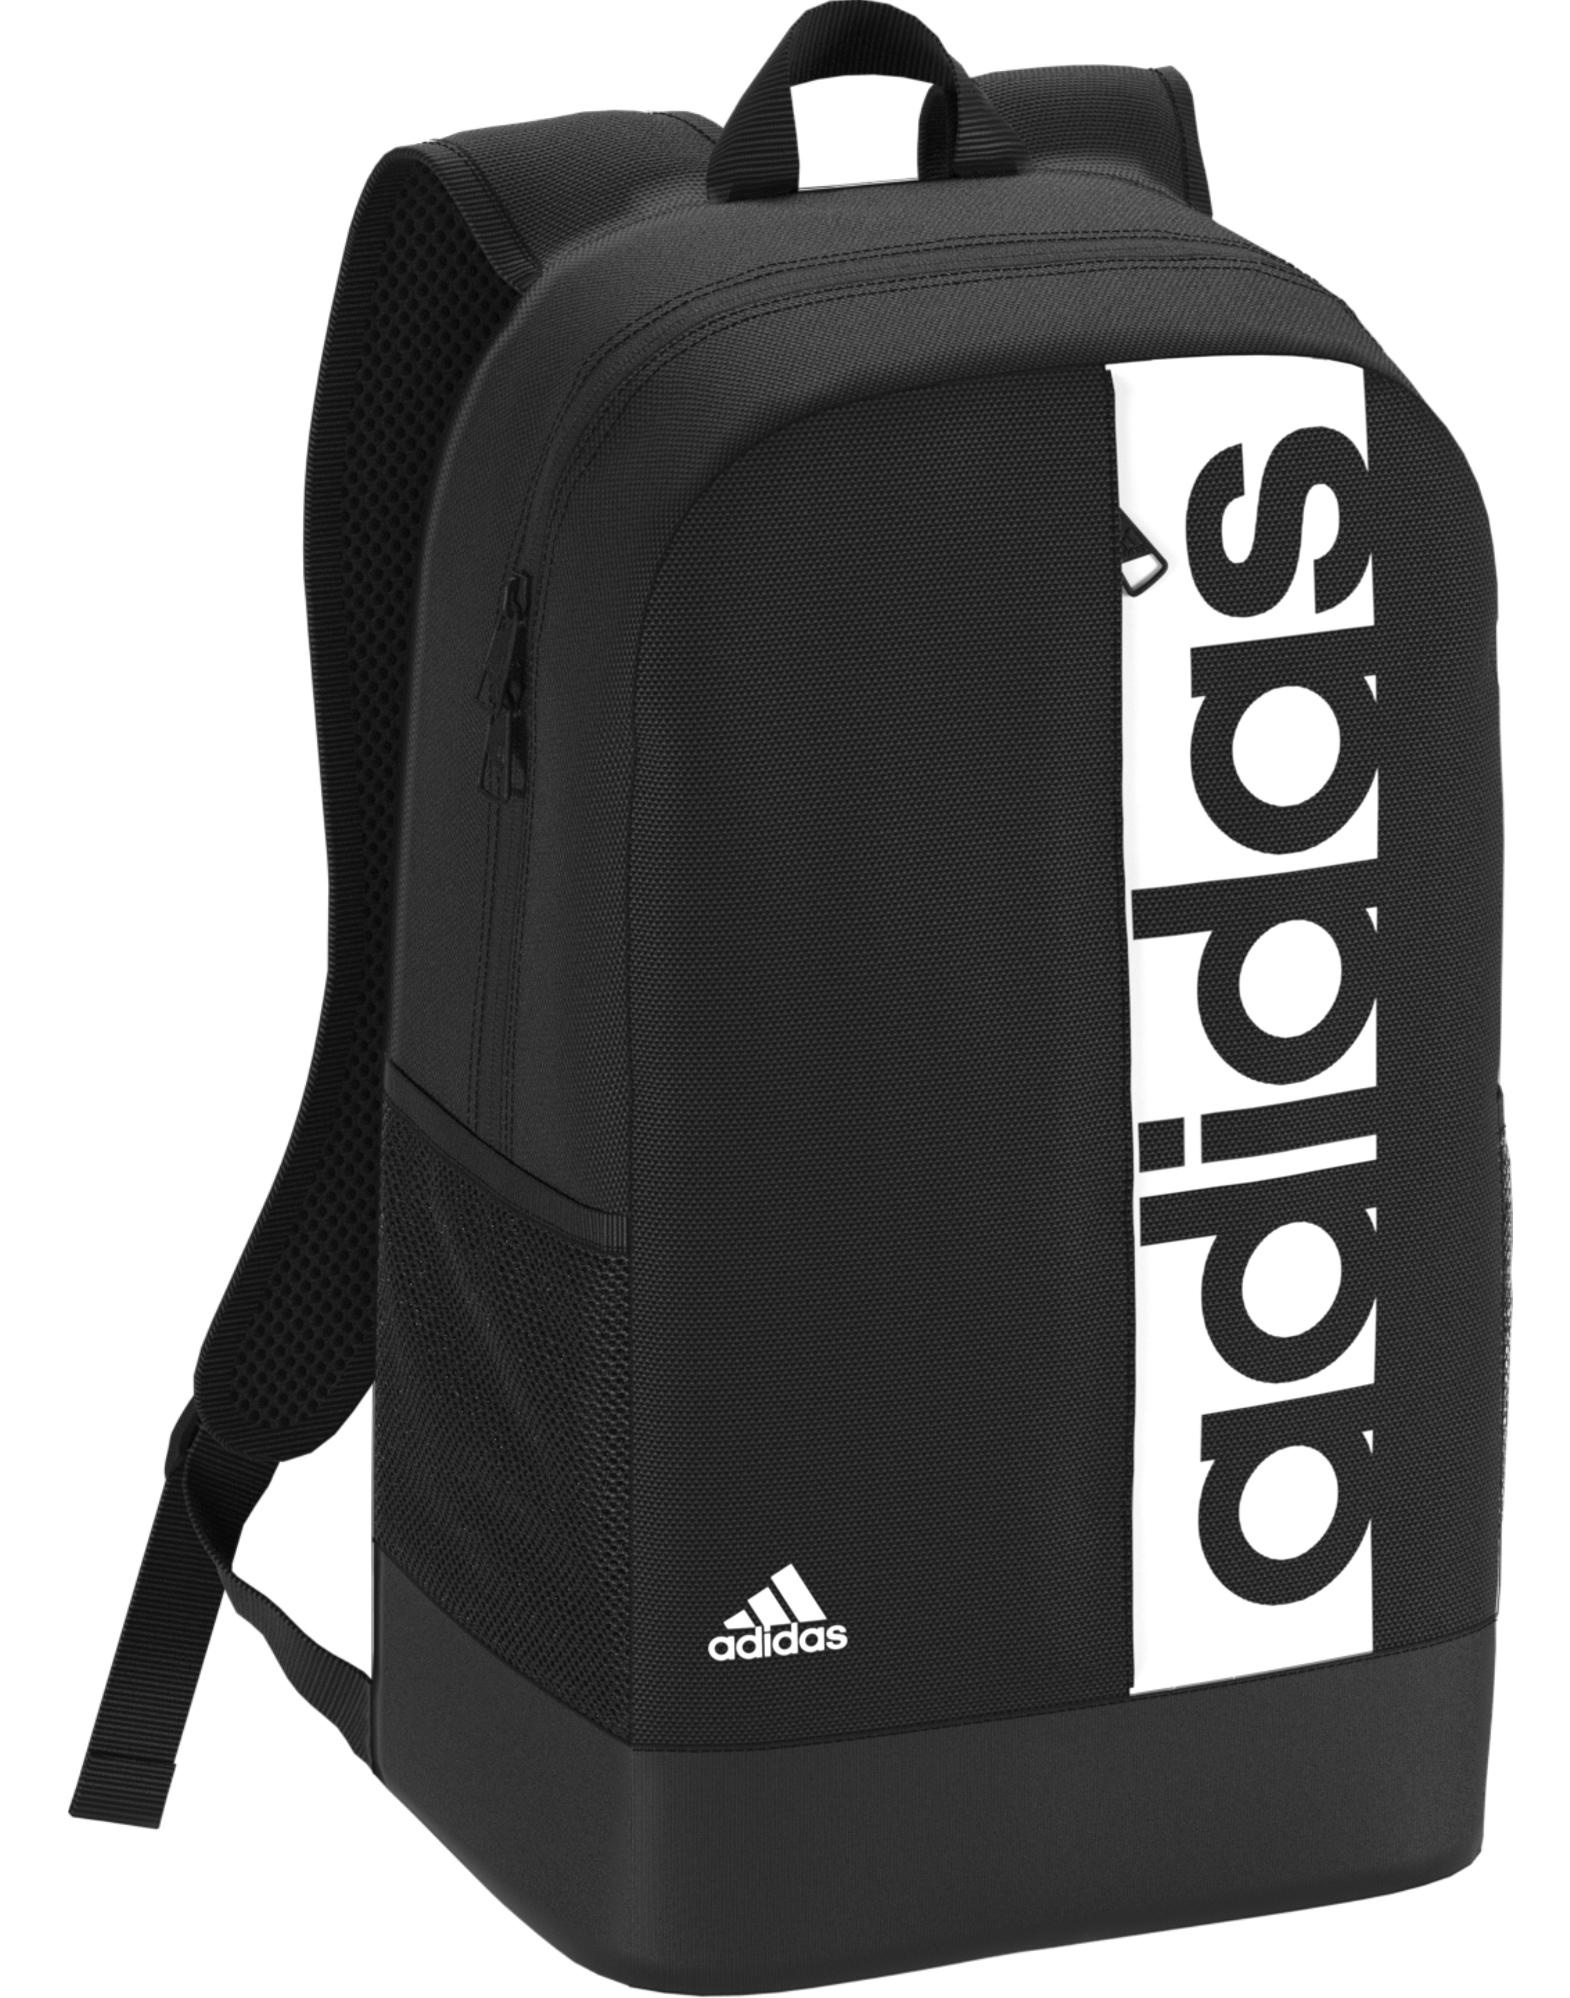 adidas Linear Per Backpack Rucksack